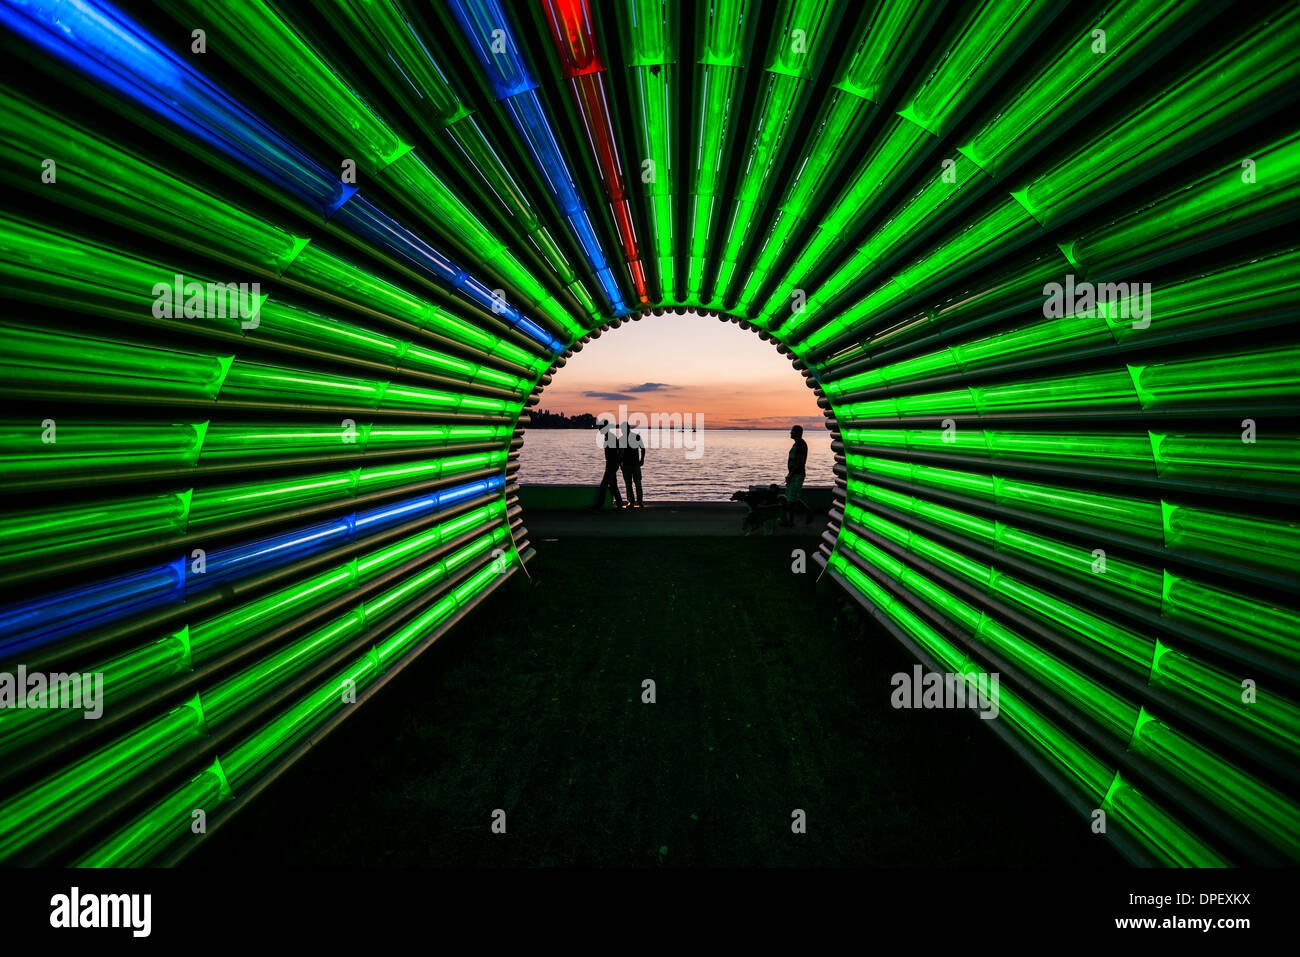 Light tunnel by the artist Gerry Ammann, looking towards Lake Constance, at sunset, Bregenz, Vorarlberg, Austria Stock Photo